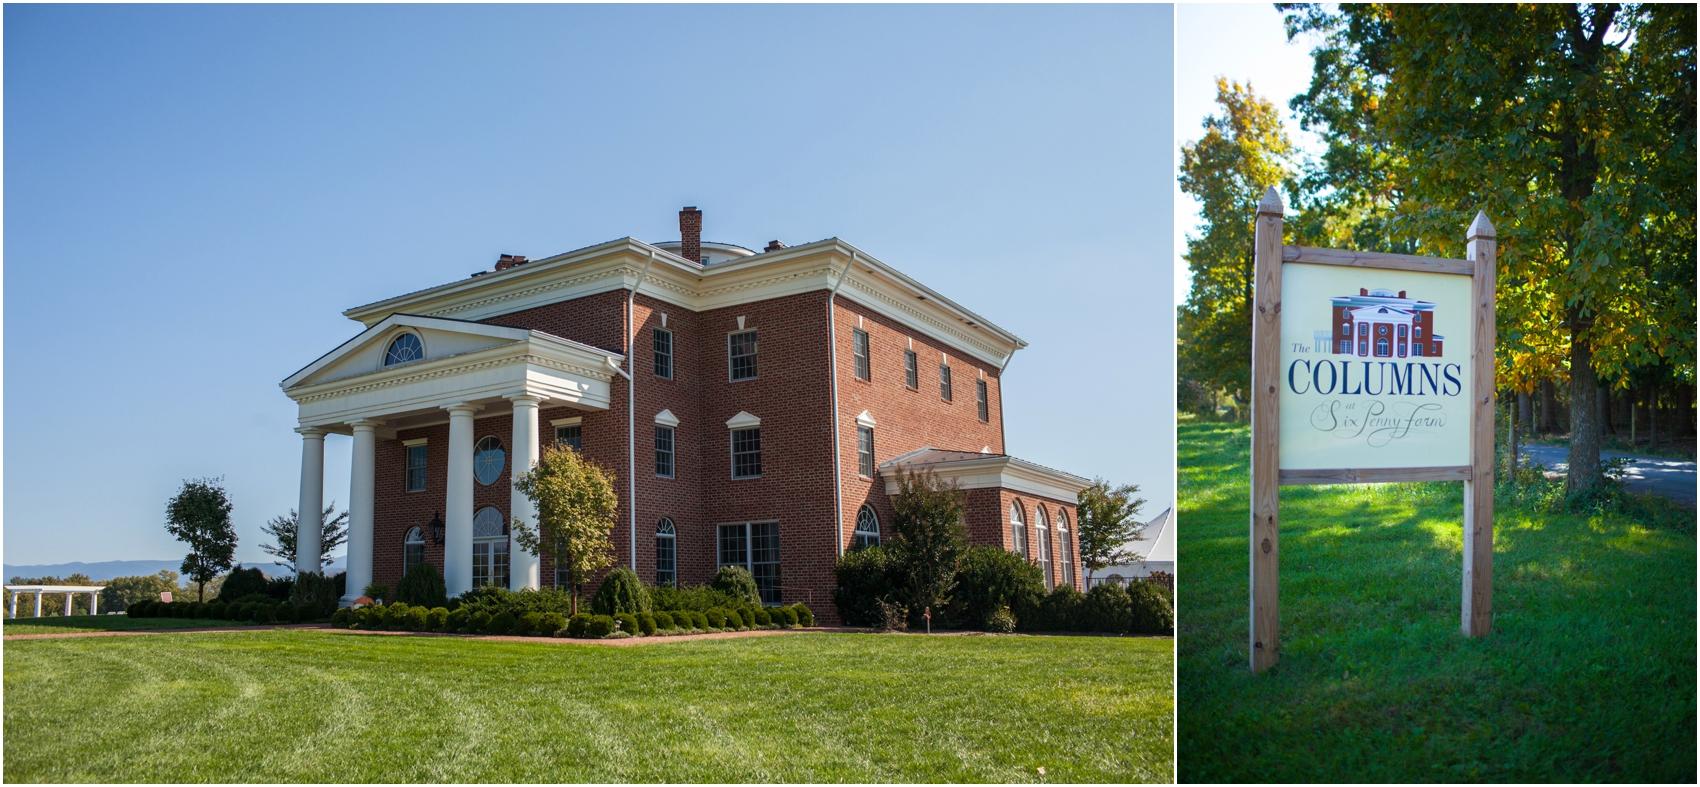 Columns-at-Six-Penny-Farm-Virginia-Fall-Wedding-7635.jpg